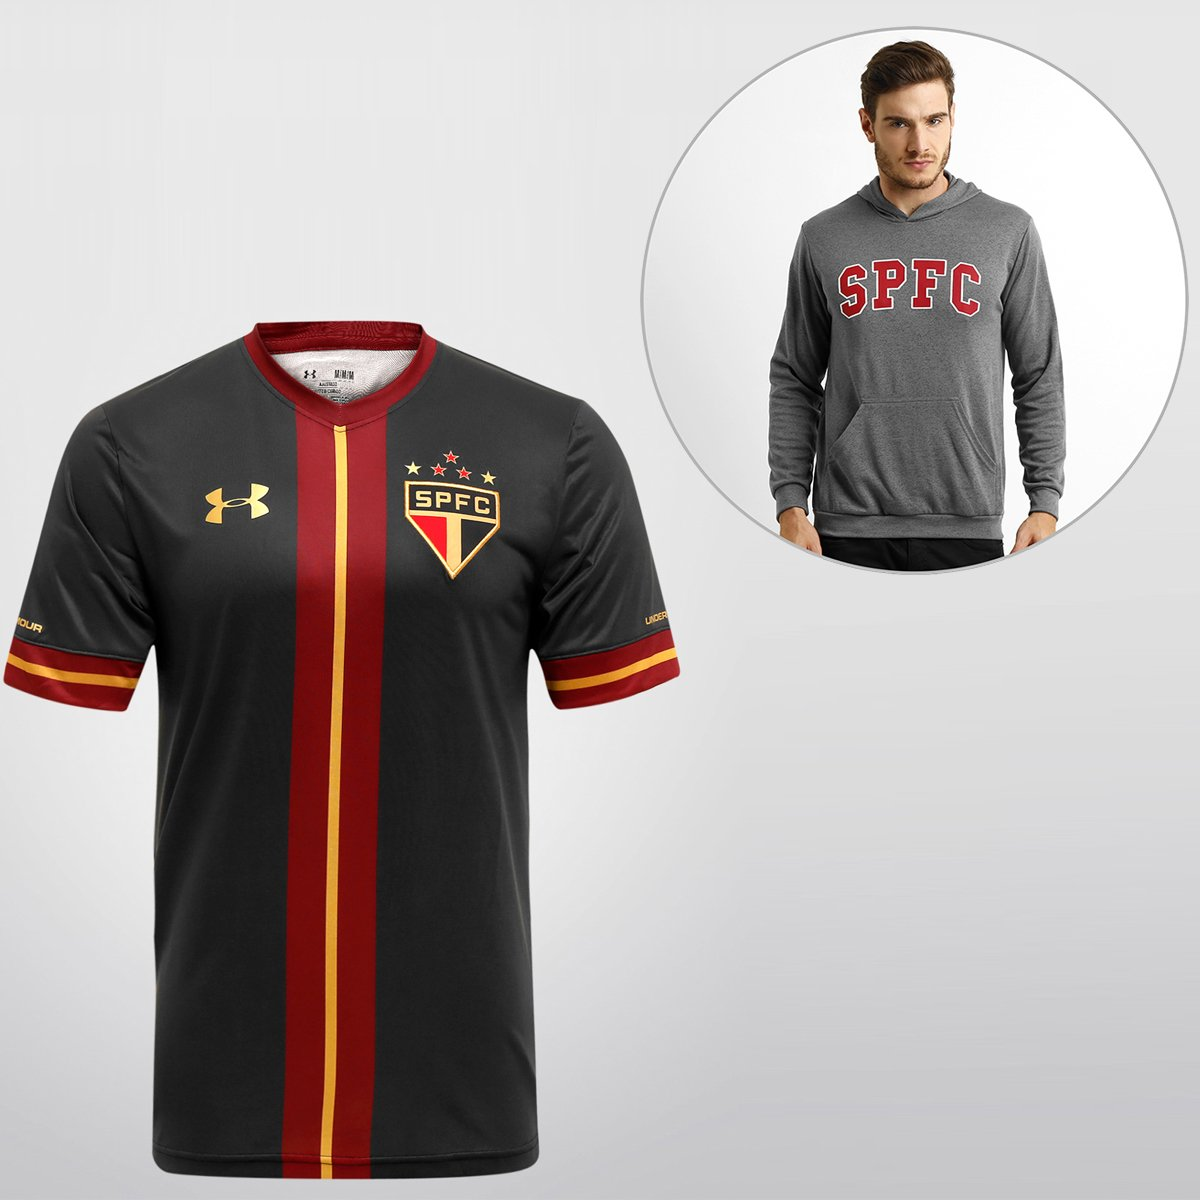 140521890c Kit SPFC - Camisa Under Armour São Paulo III 15/16 s/nº + Blusão College |  Netshoes